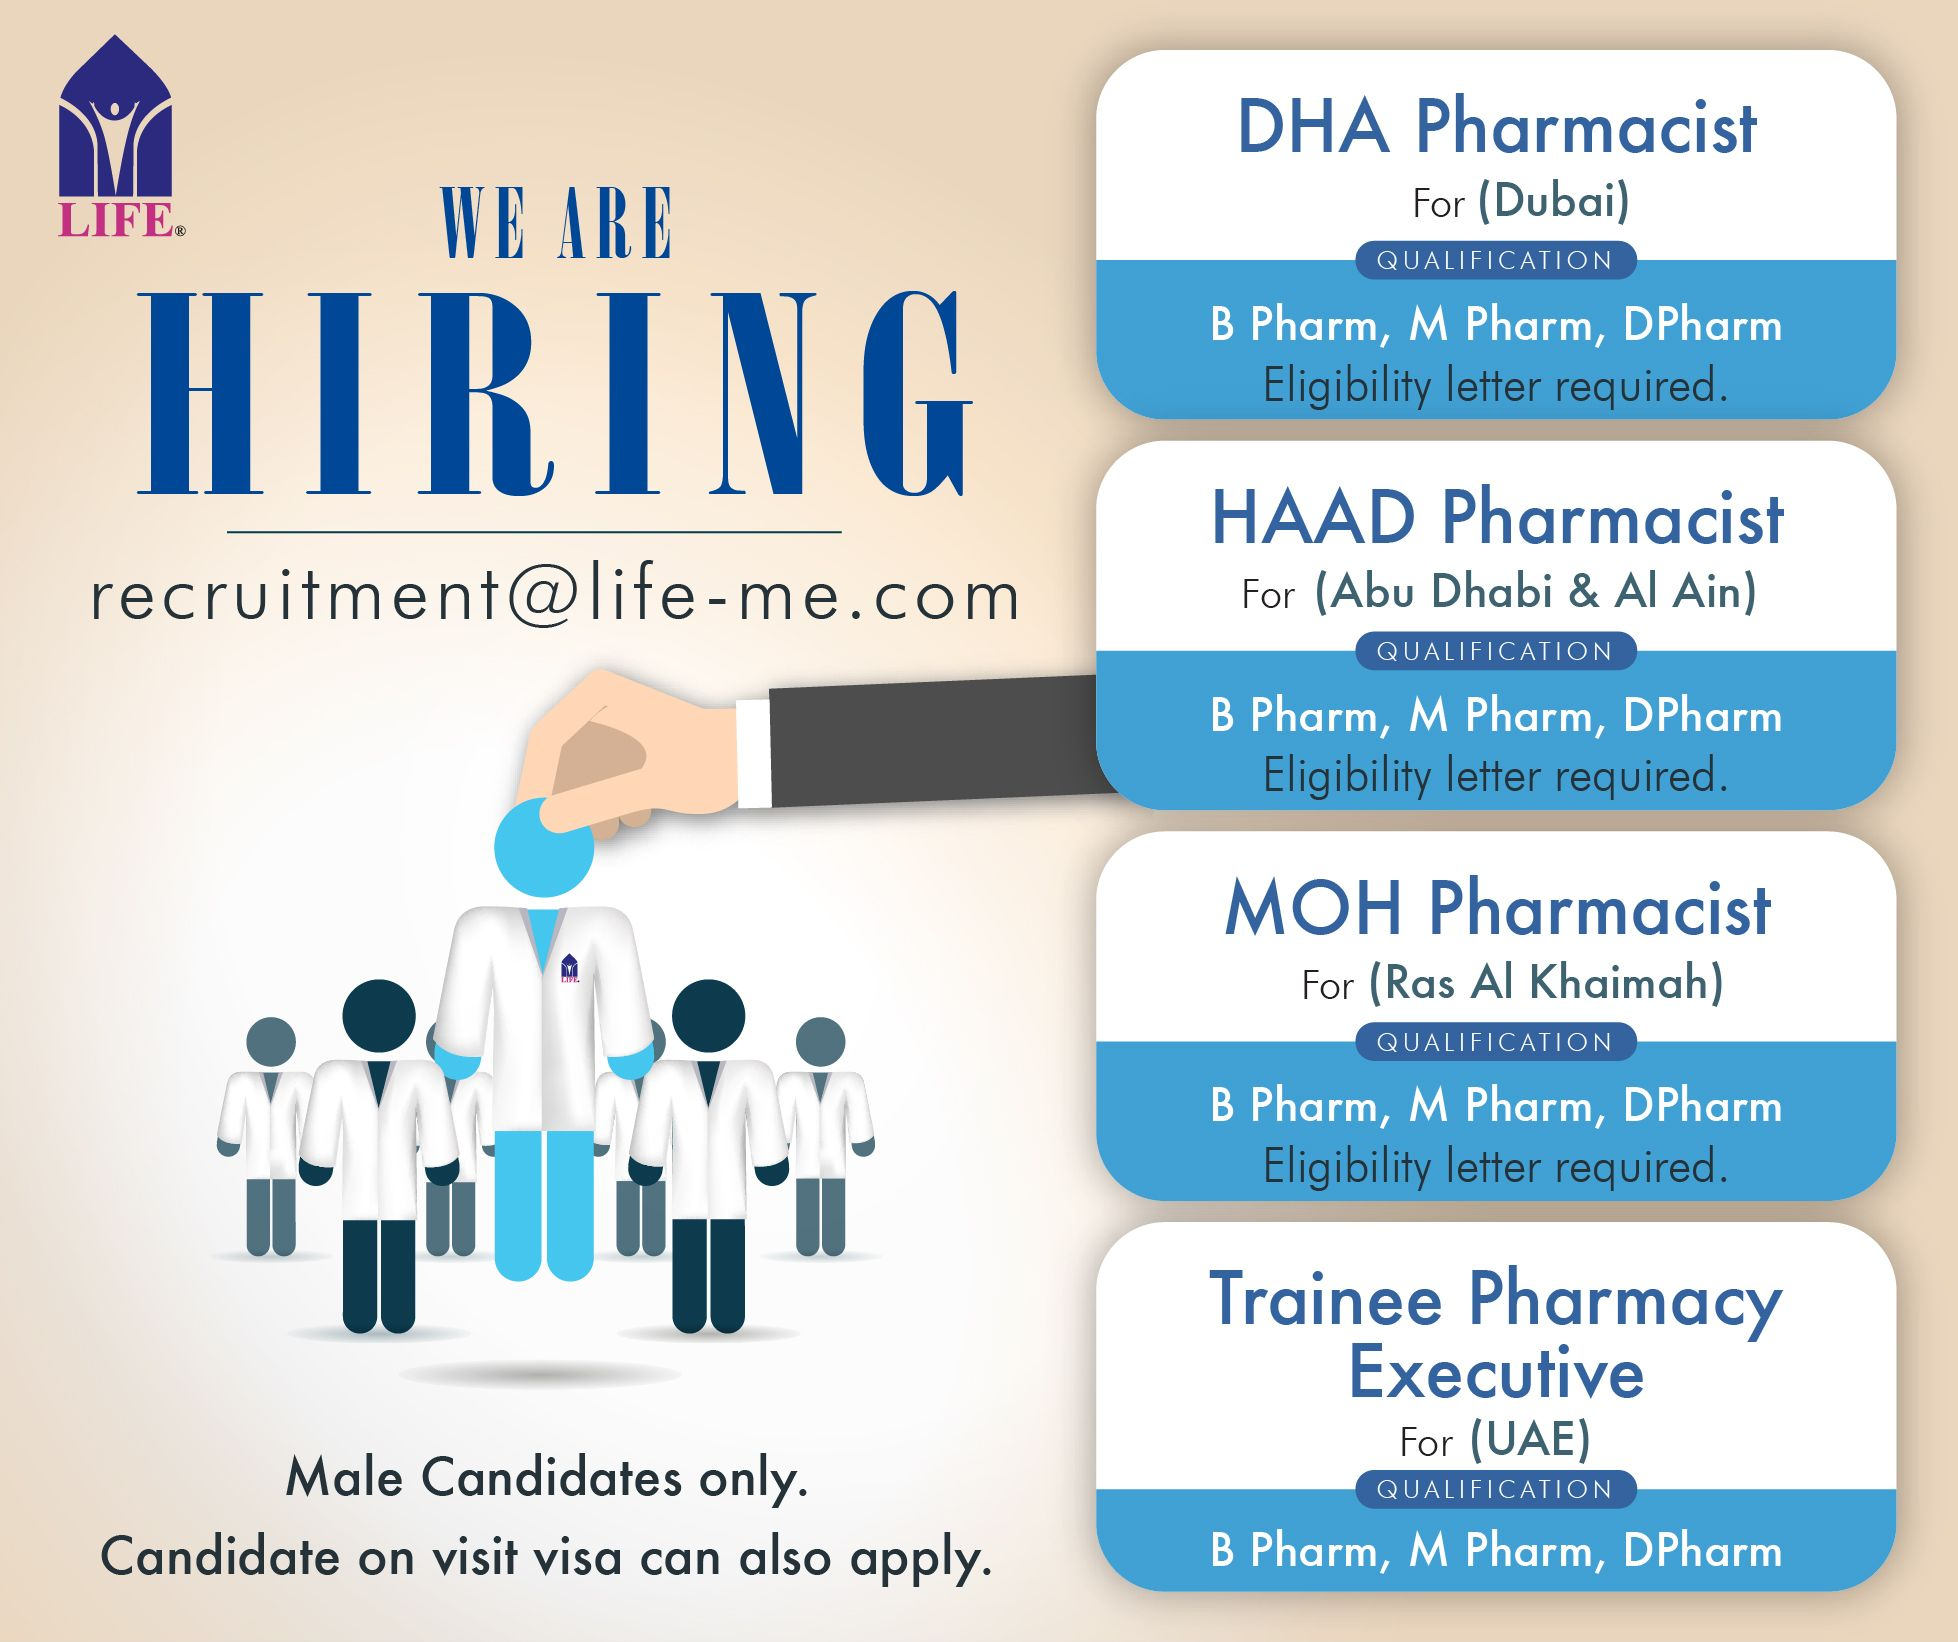 pharmacist with moh dha haad and trainee pharmacy executive - Pharmacist Trainee